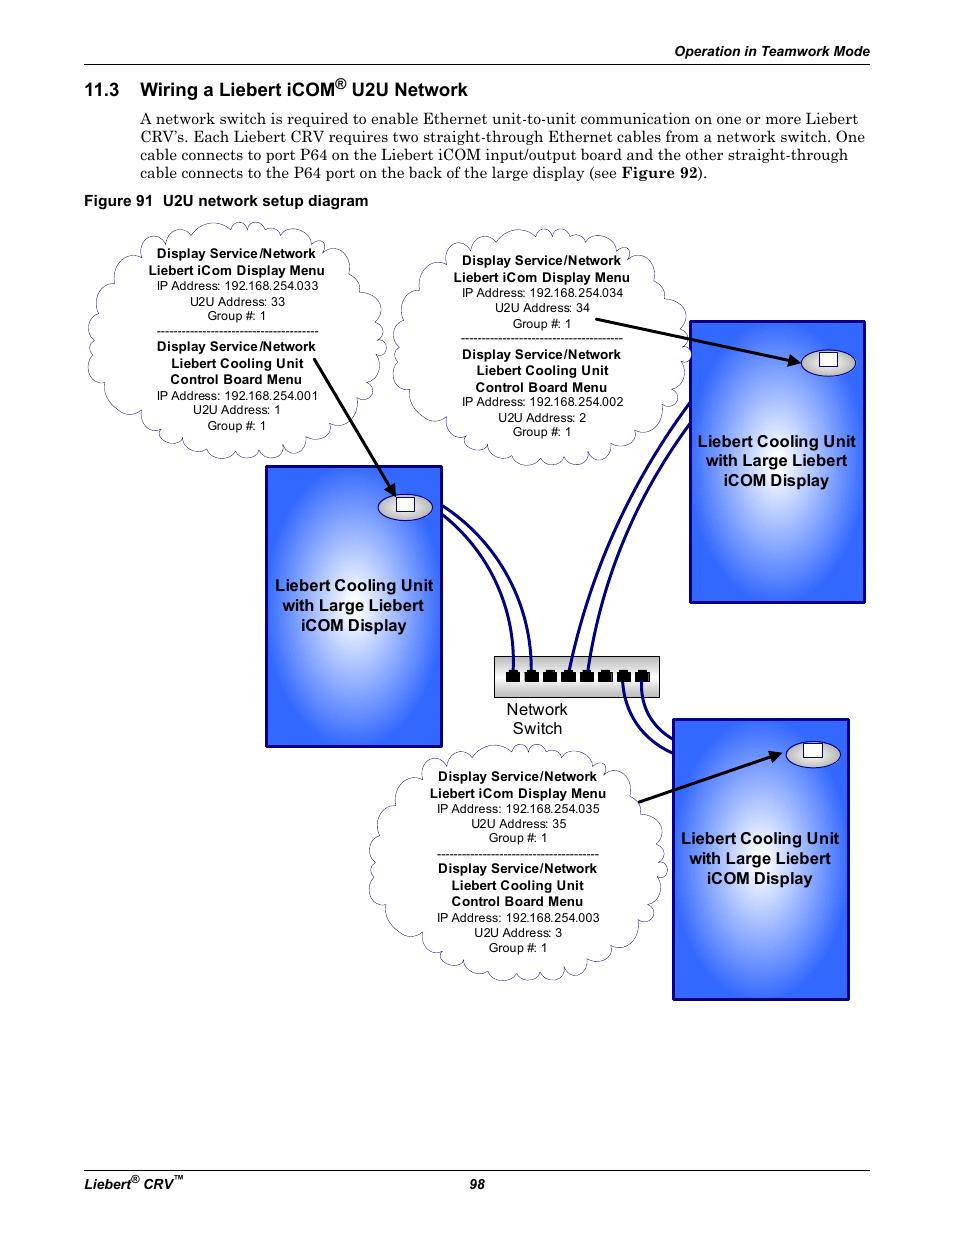 3 Wiring A Liebert Icom U2u Network Figure 91 Setup Straight Through Cable Diagram Emerson Crv 1 2 4 5 6 7 8 9 10 11 12 13 14 15